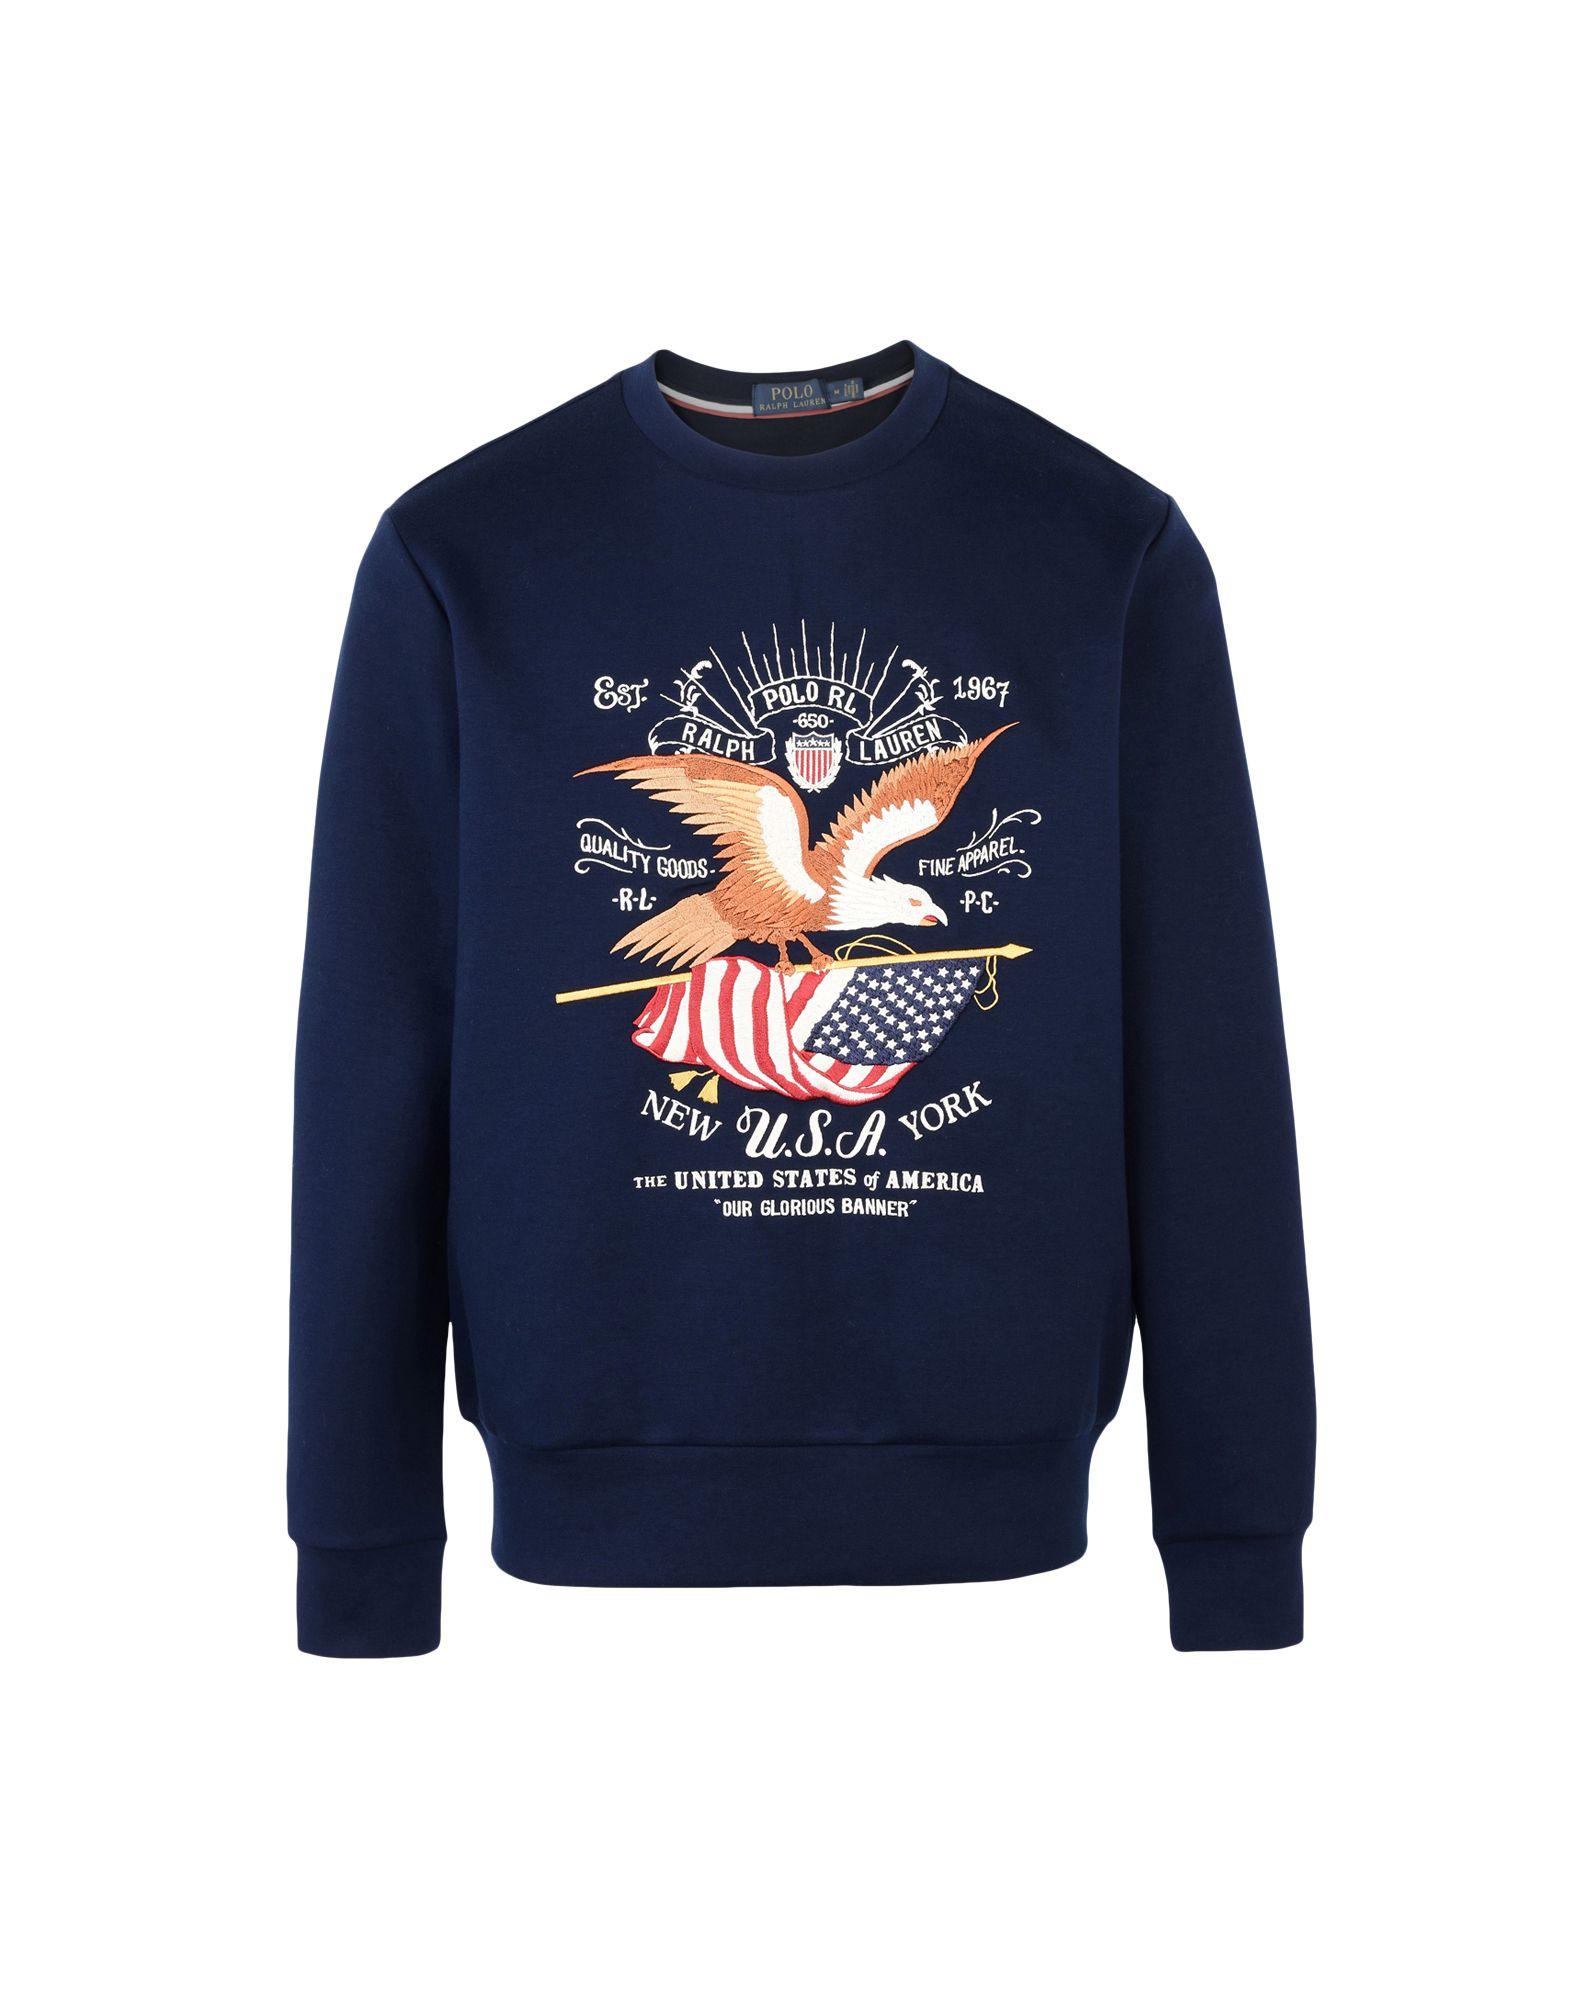 Felpa Polo Ralph Lauren Double Knit - Uomo - Acquista online su